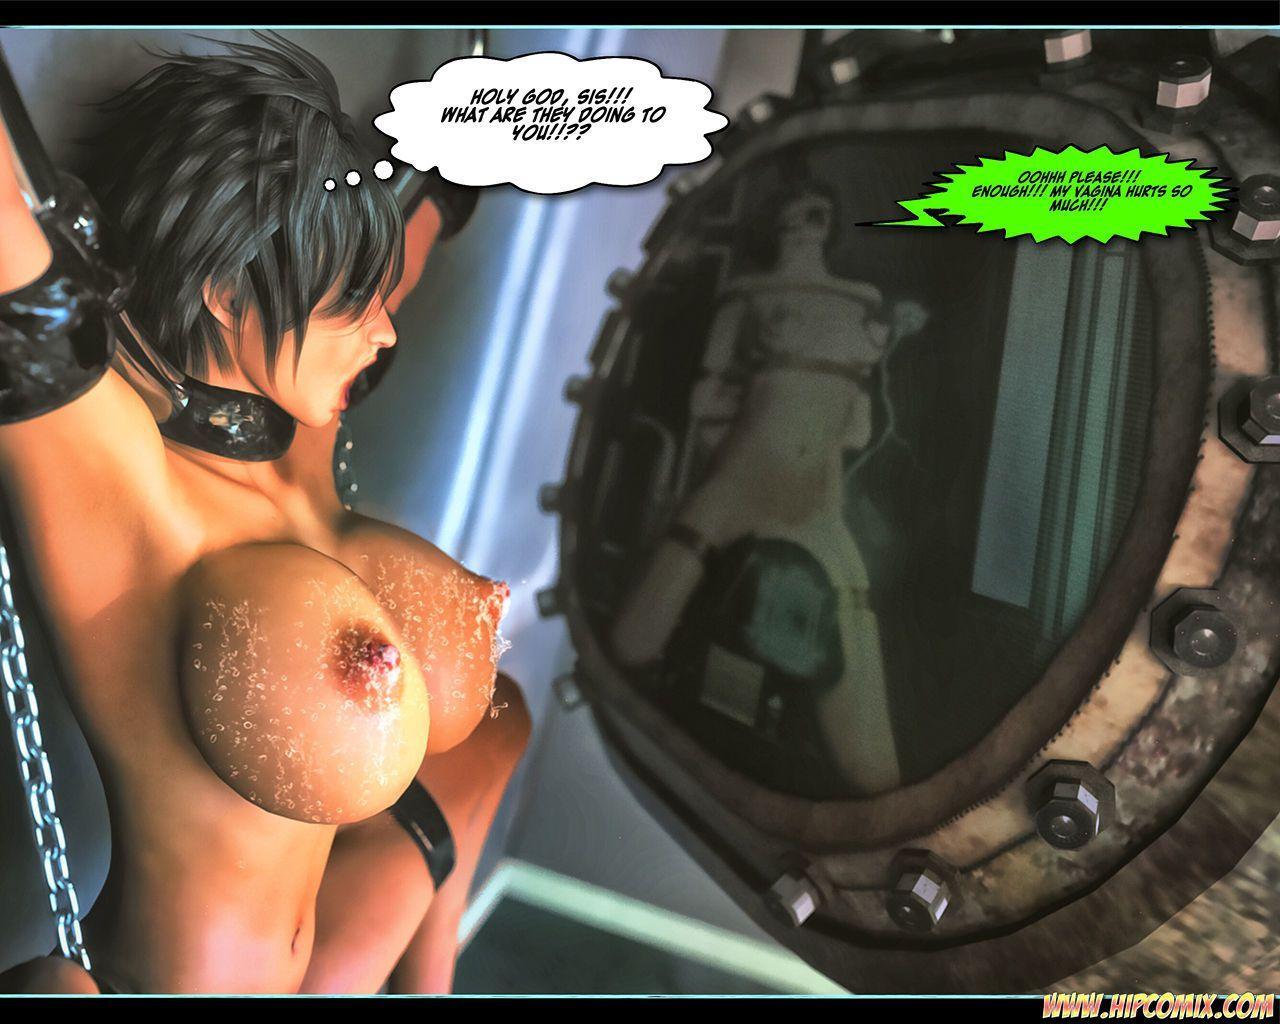 [Mitru] Hip Girl - Captive of Guul 9-10 [English] - part 2